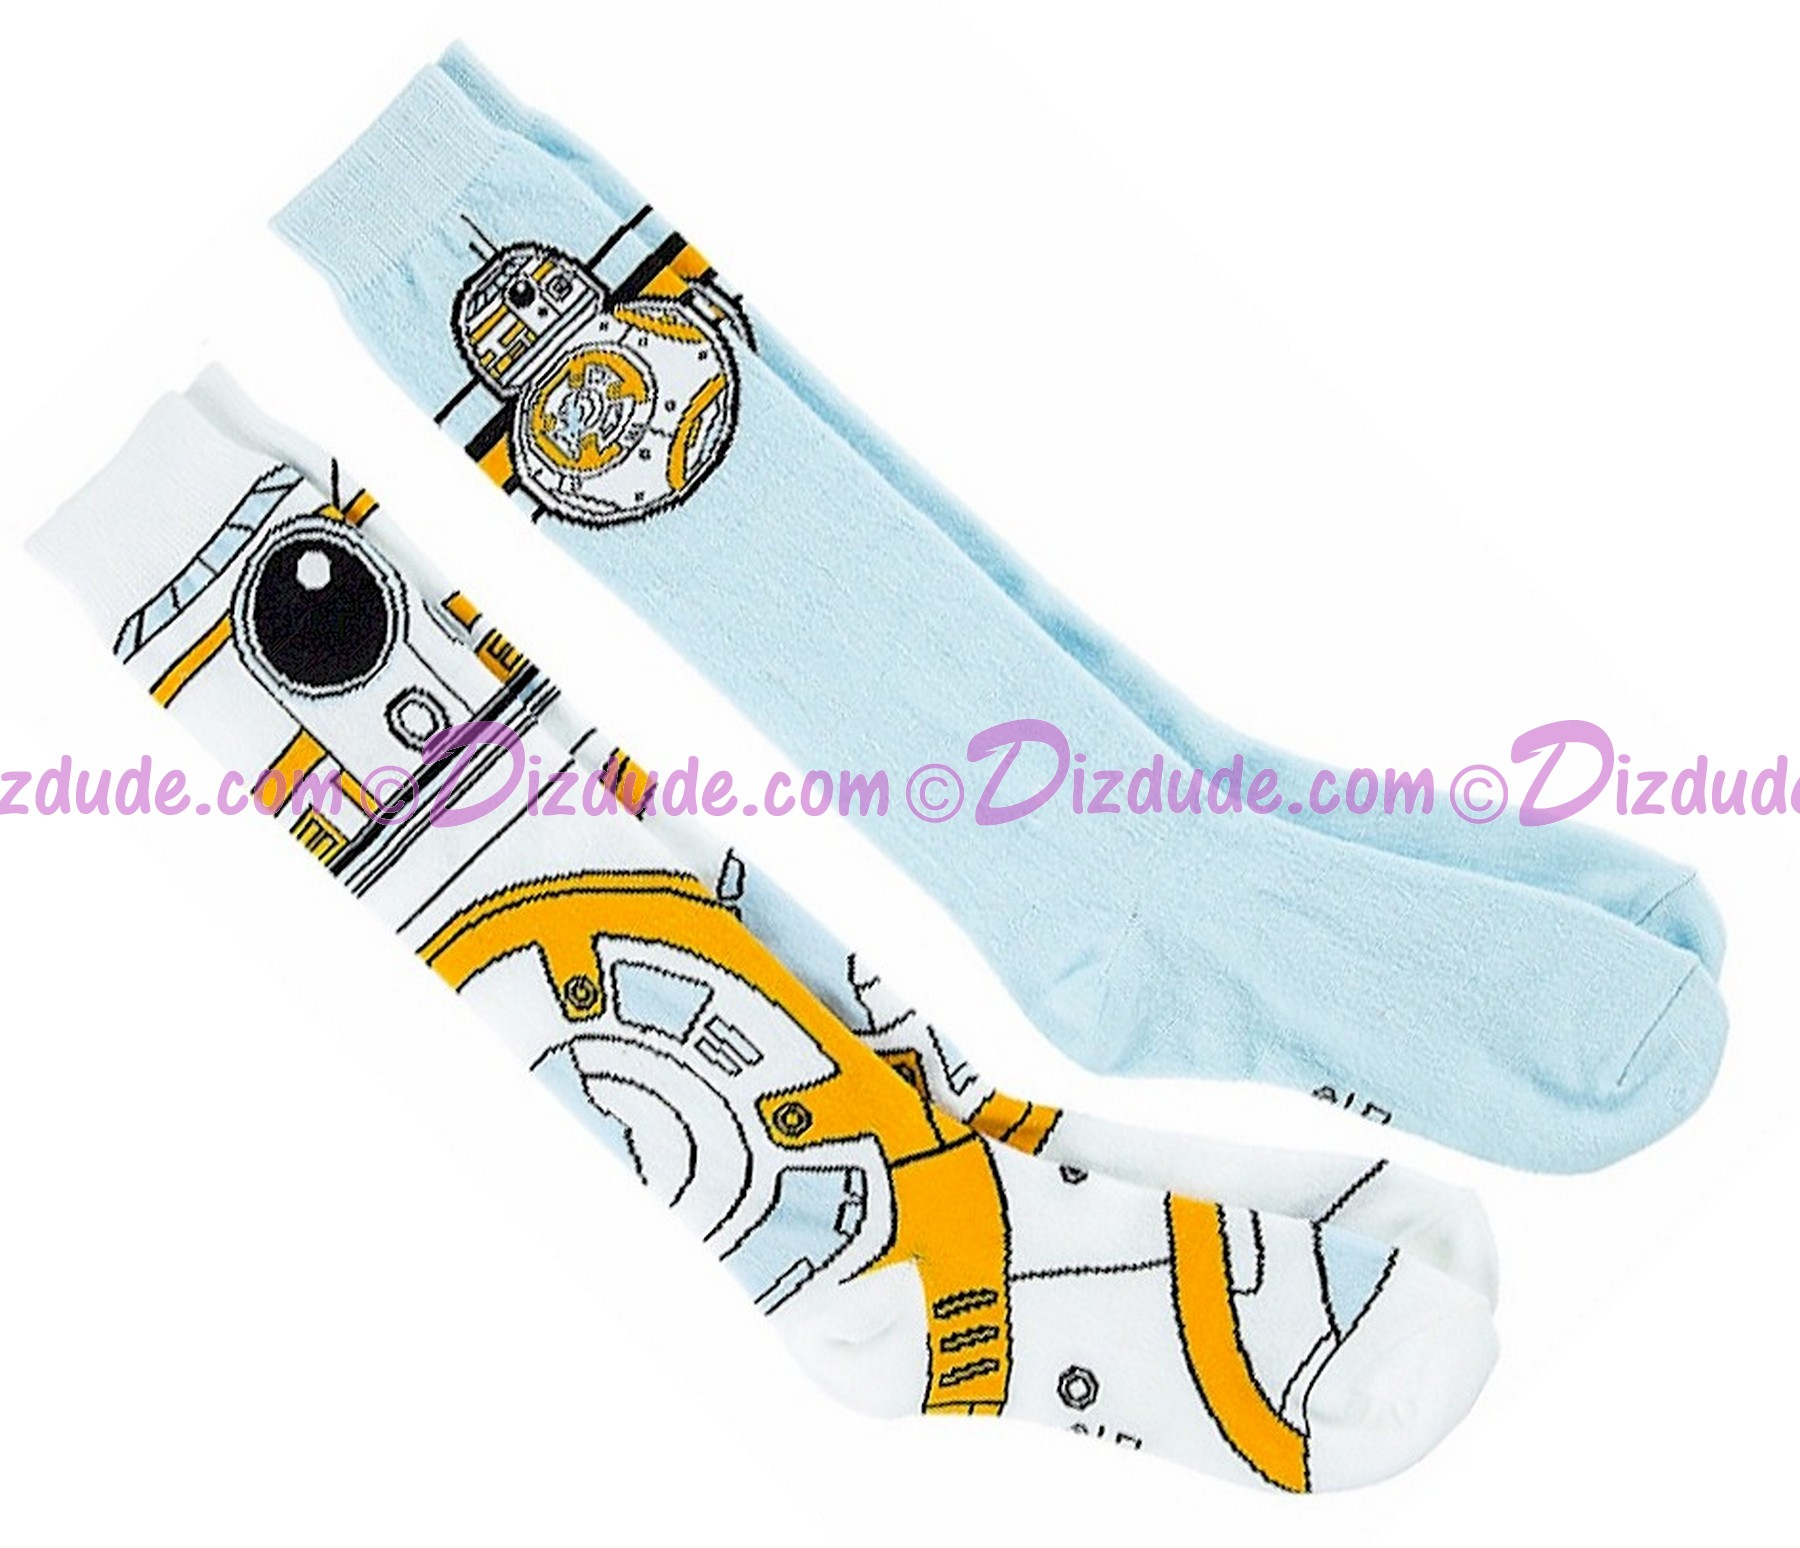 BB-8 Set of 2 Adult Socks ~ Disney Star Wars The Force Awakens